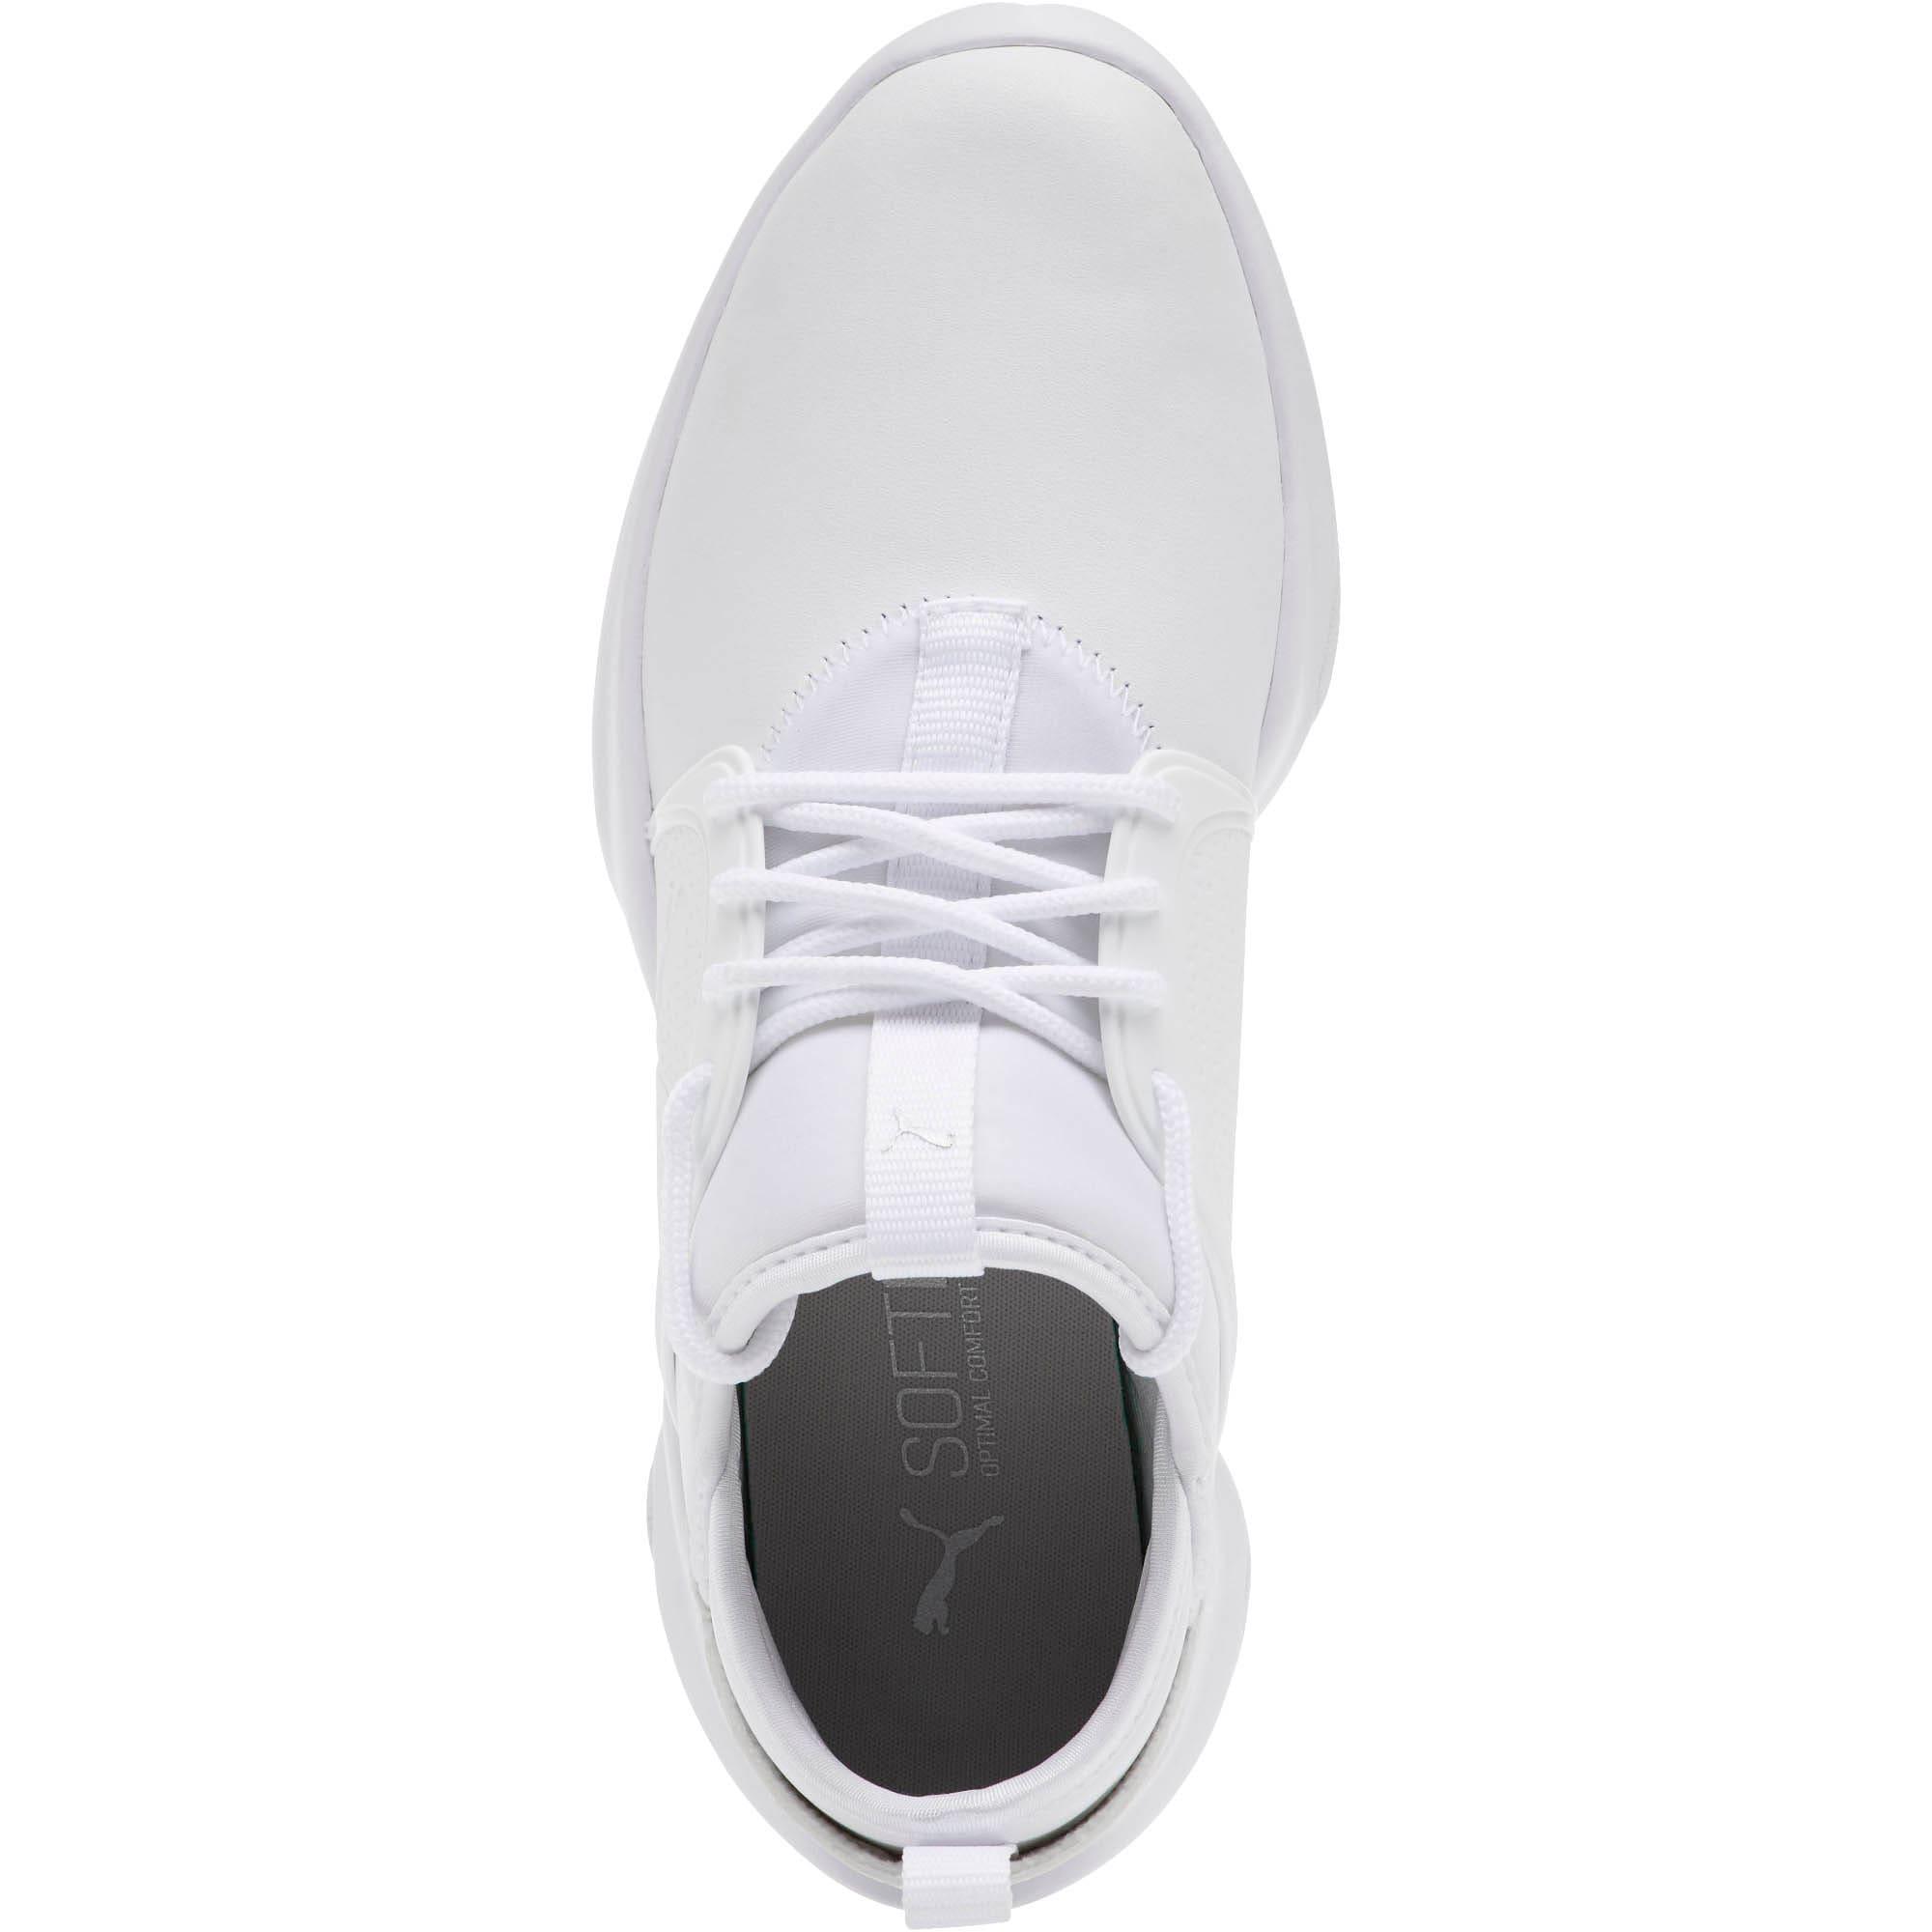 Thumbnail 5 of PUMA Dare Lace Women's Sneakers, P. White-P. White-P. White, medium